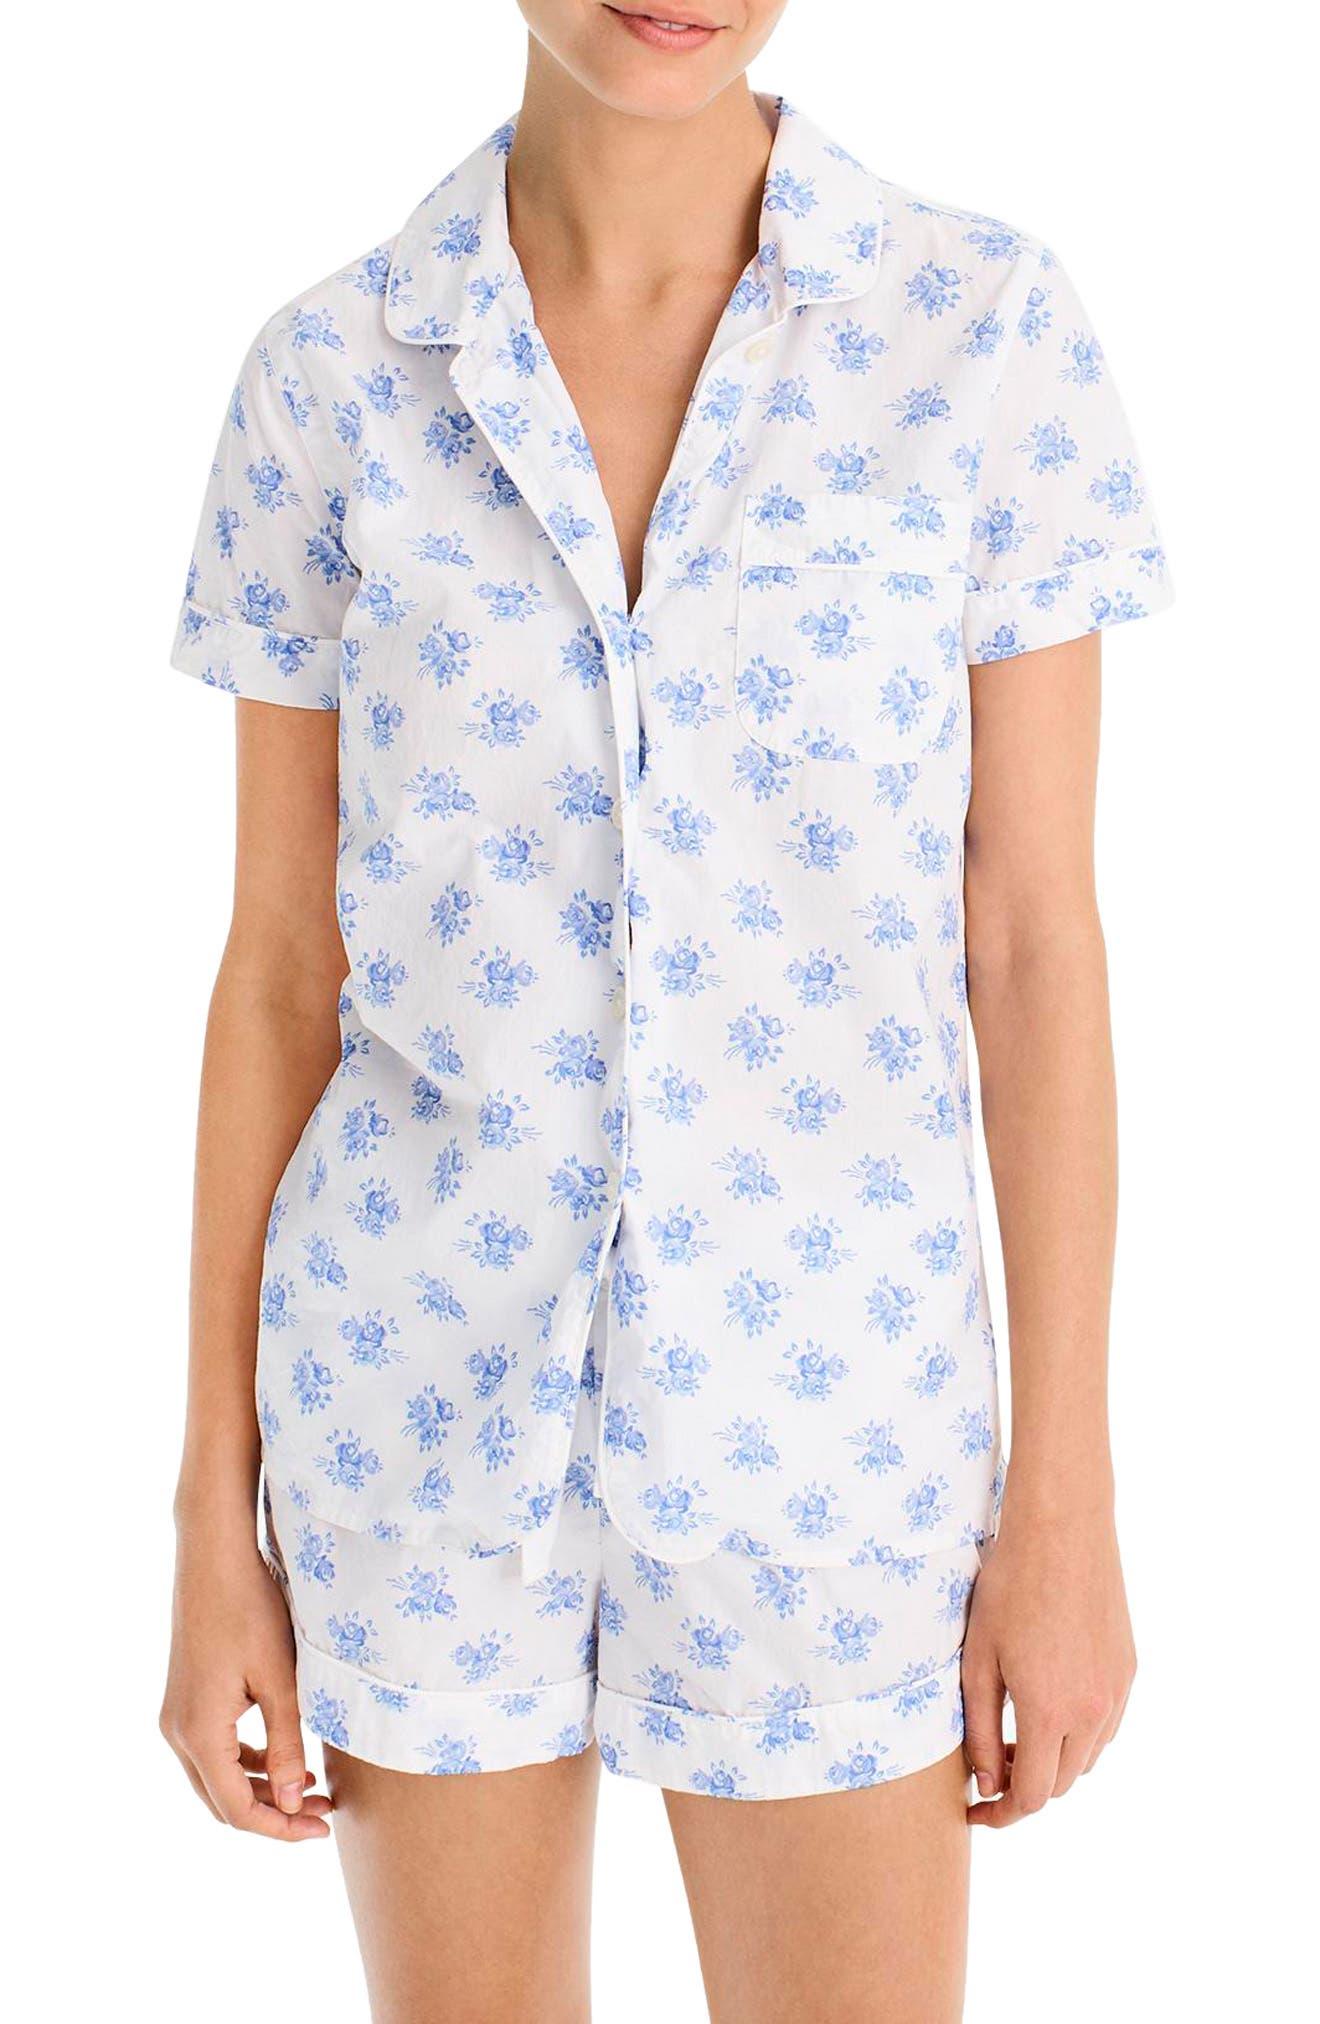 Sweet Pea Pajamas,                         Main,                         color, 900